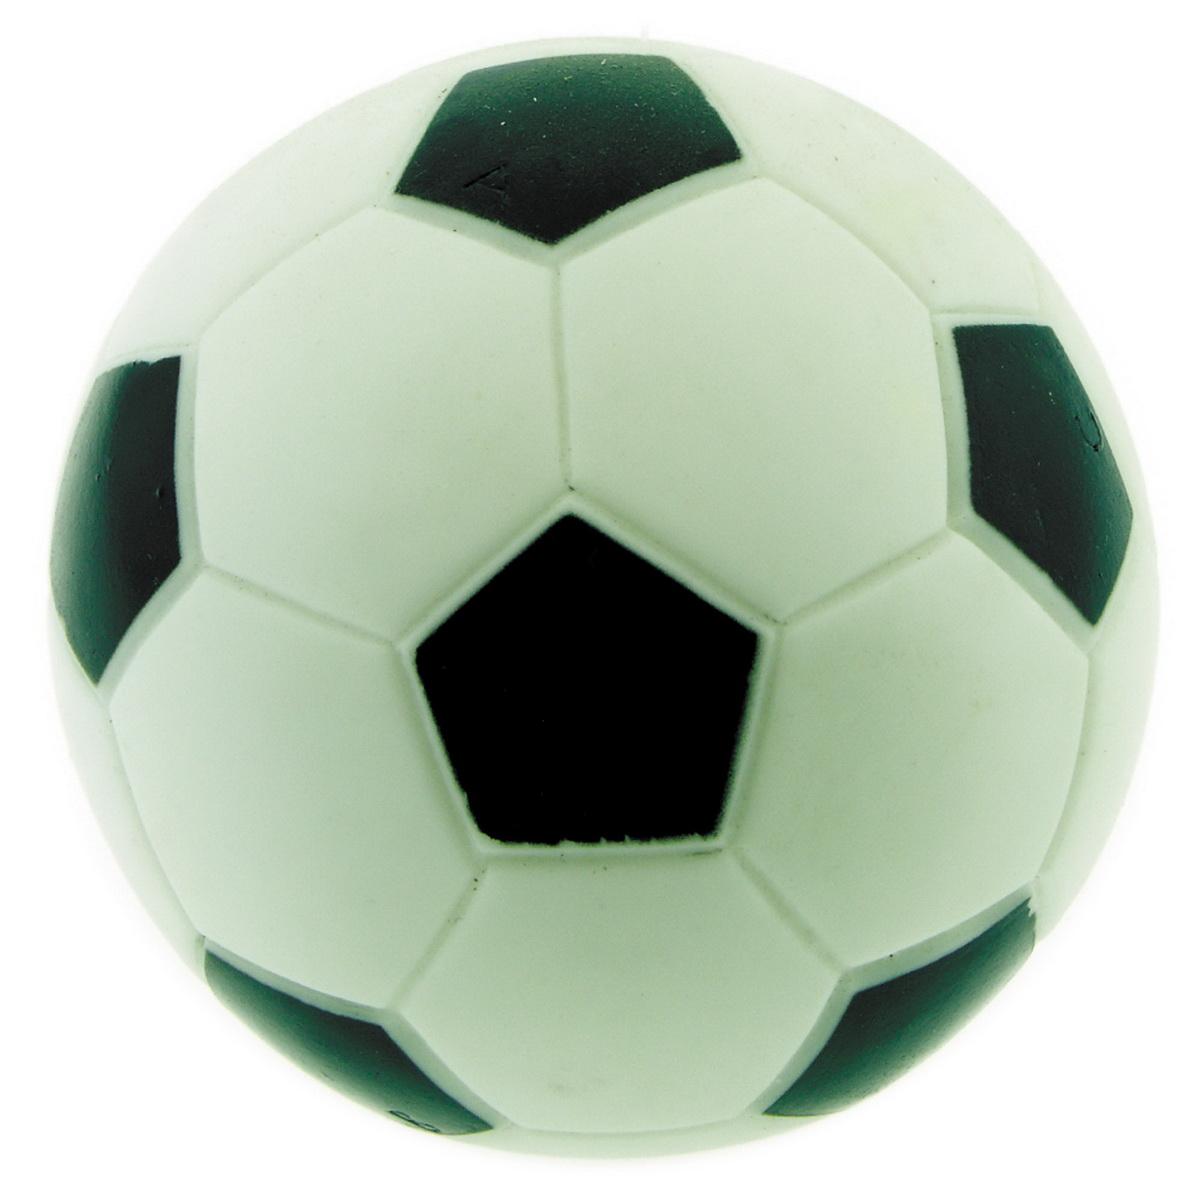 Игрушка для собак Dezzie Мяч. Футбол, диаметр 7,8 см игрушка для собак dezzie кольцо с запахом мяса диаметр 8 5 см